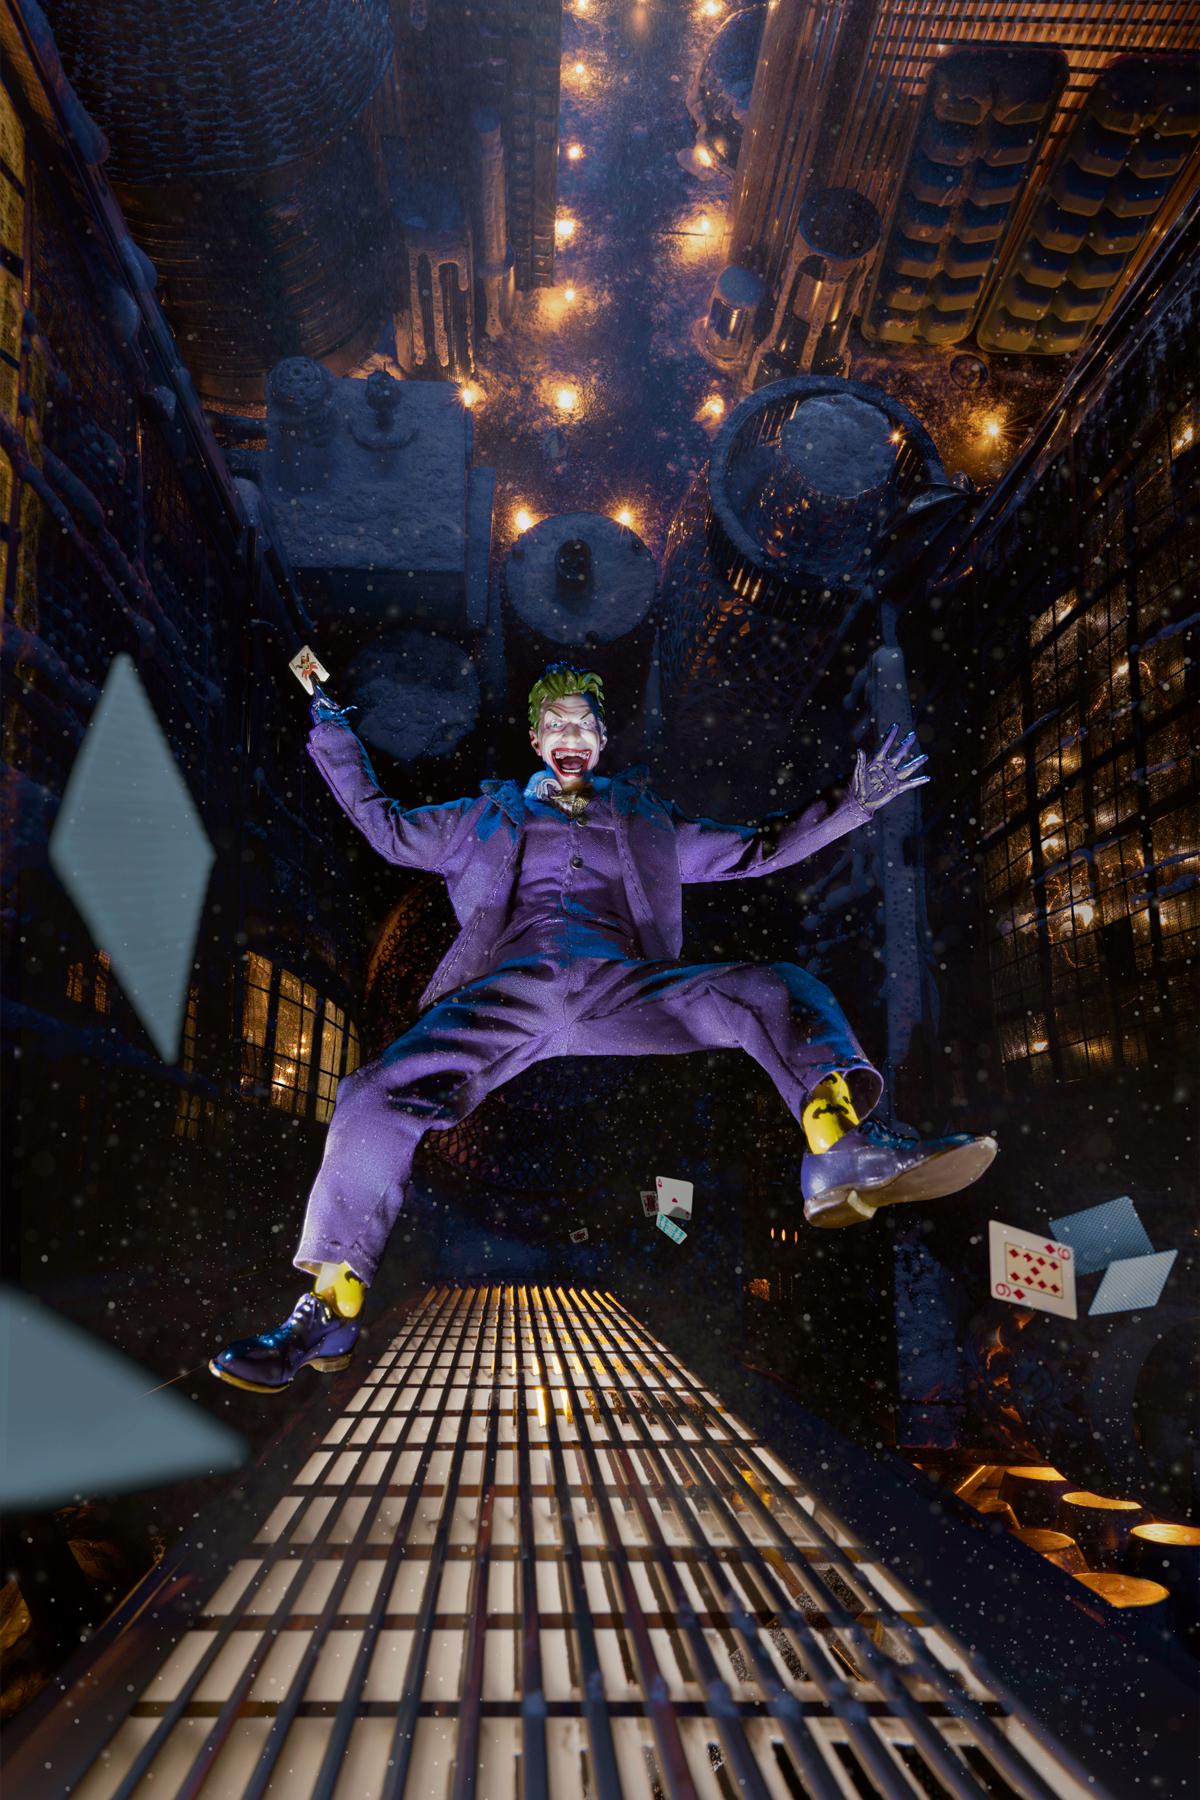 Joker: Free fall